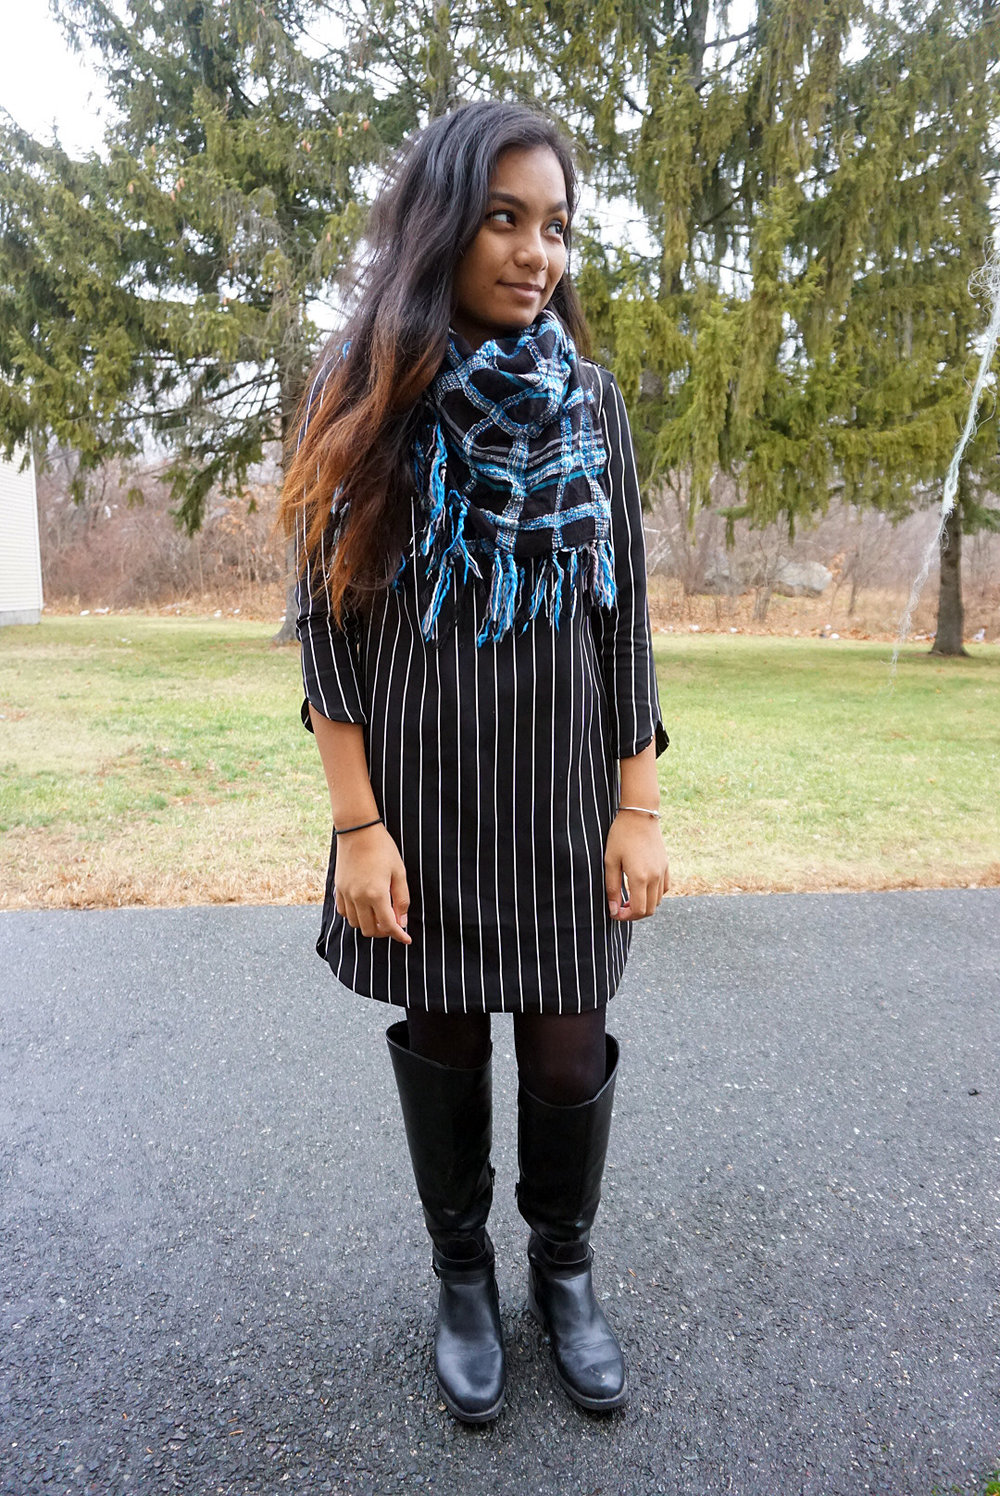 Black-White-Striped-Dress-Blogger-Style-LINDATENCHITRAN-18-1080x1616.jpg